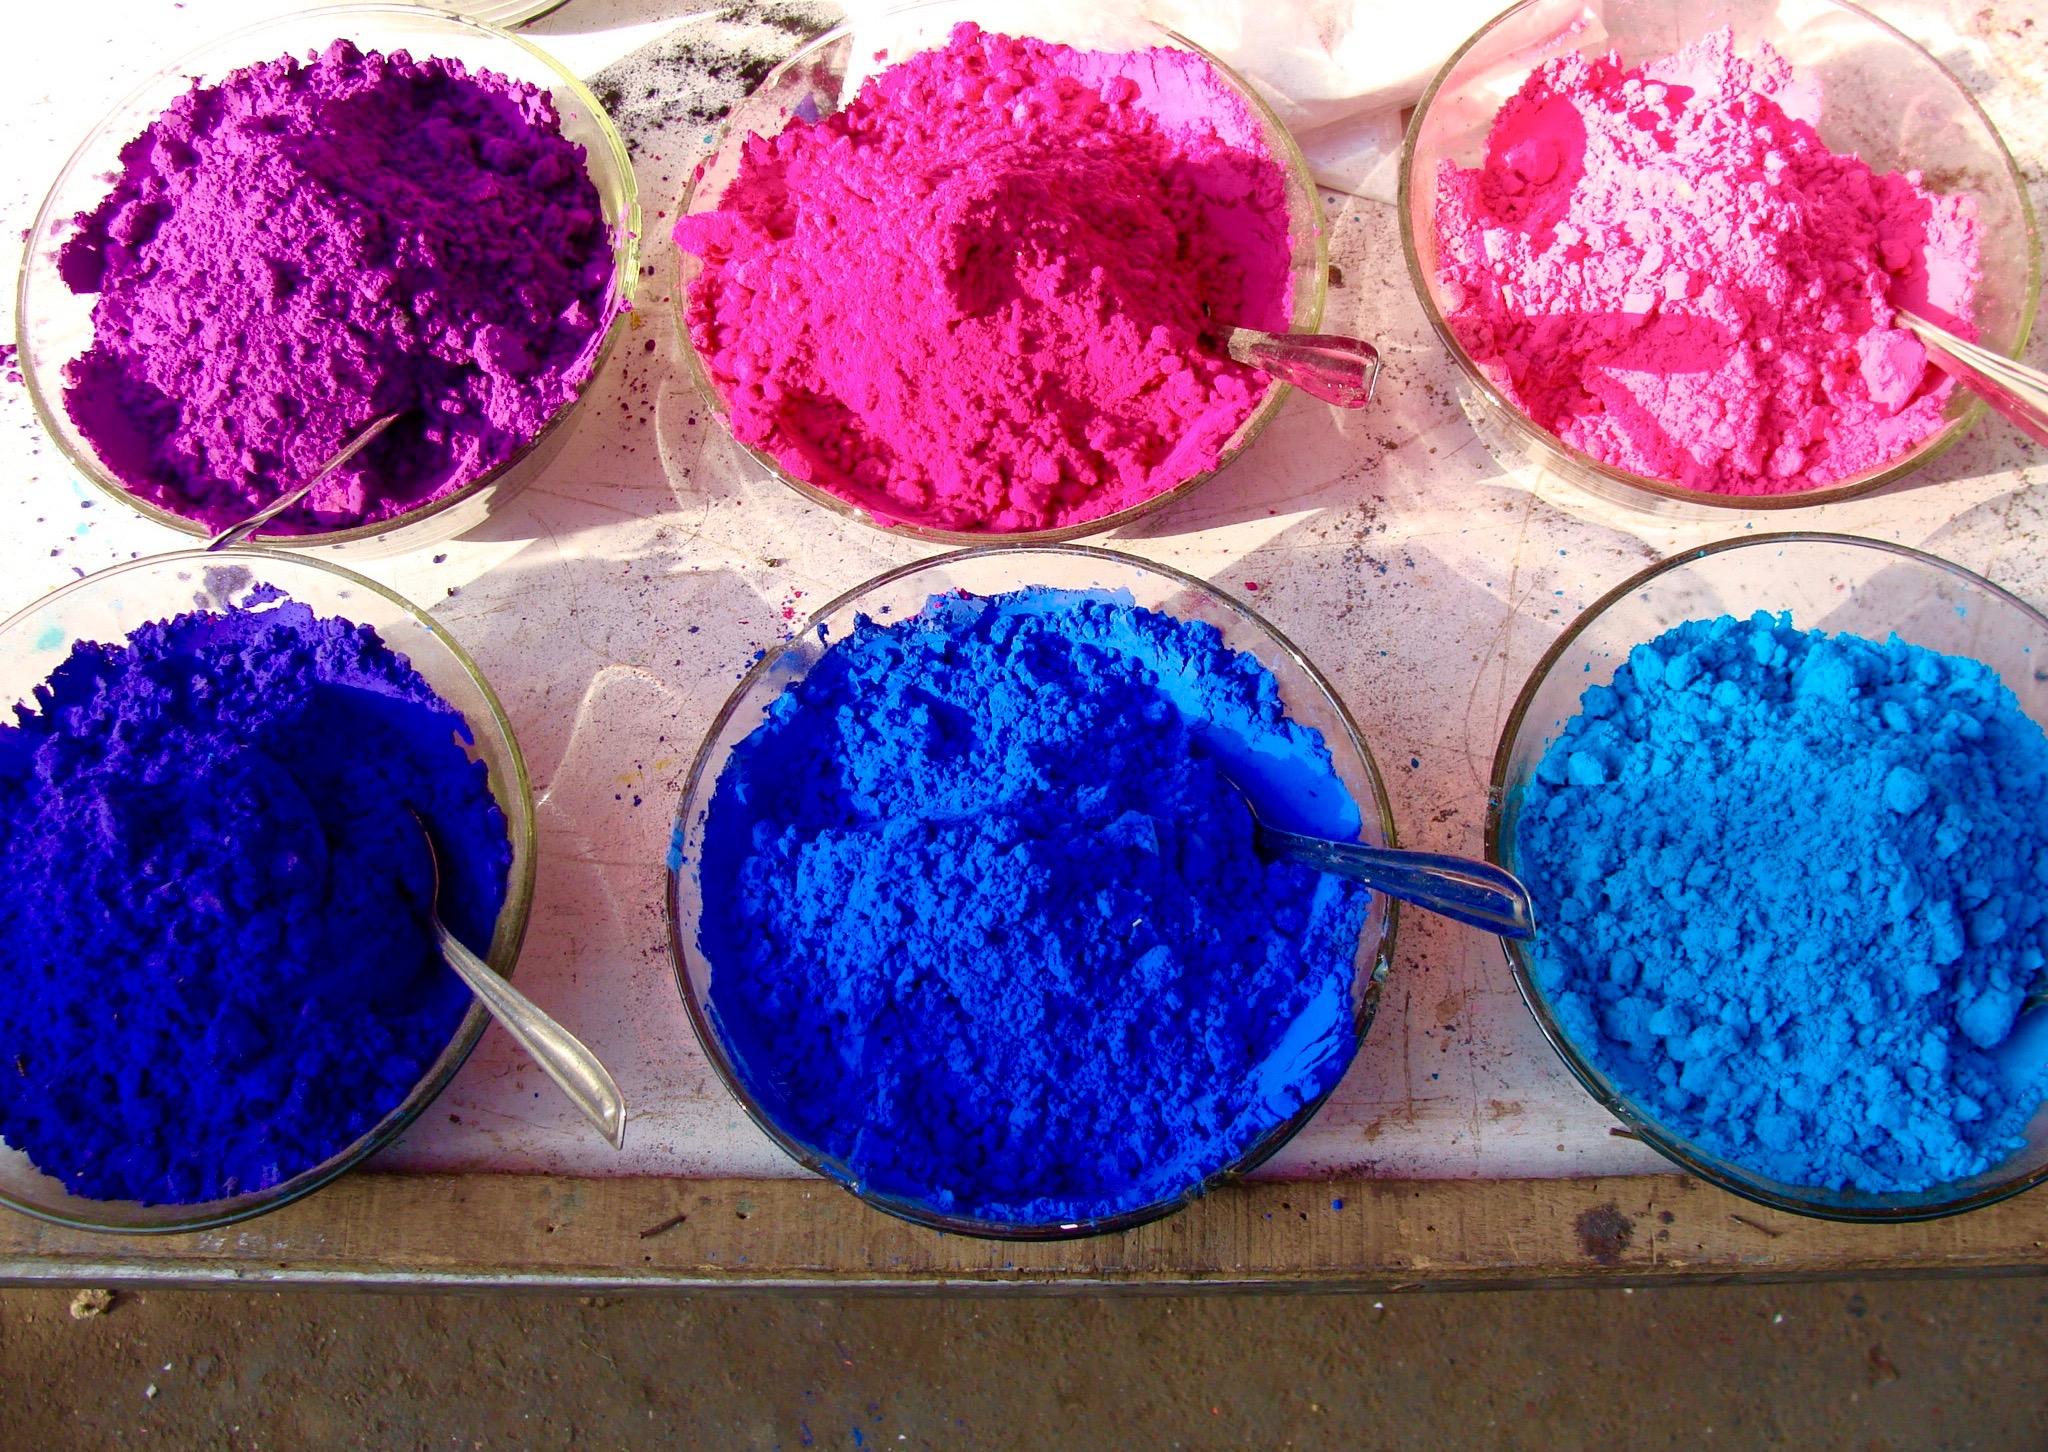 kemialliset värit